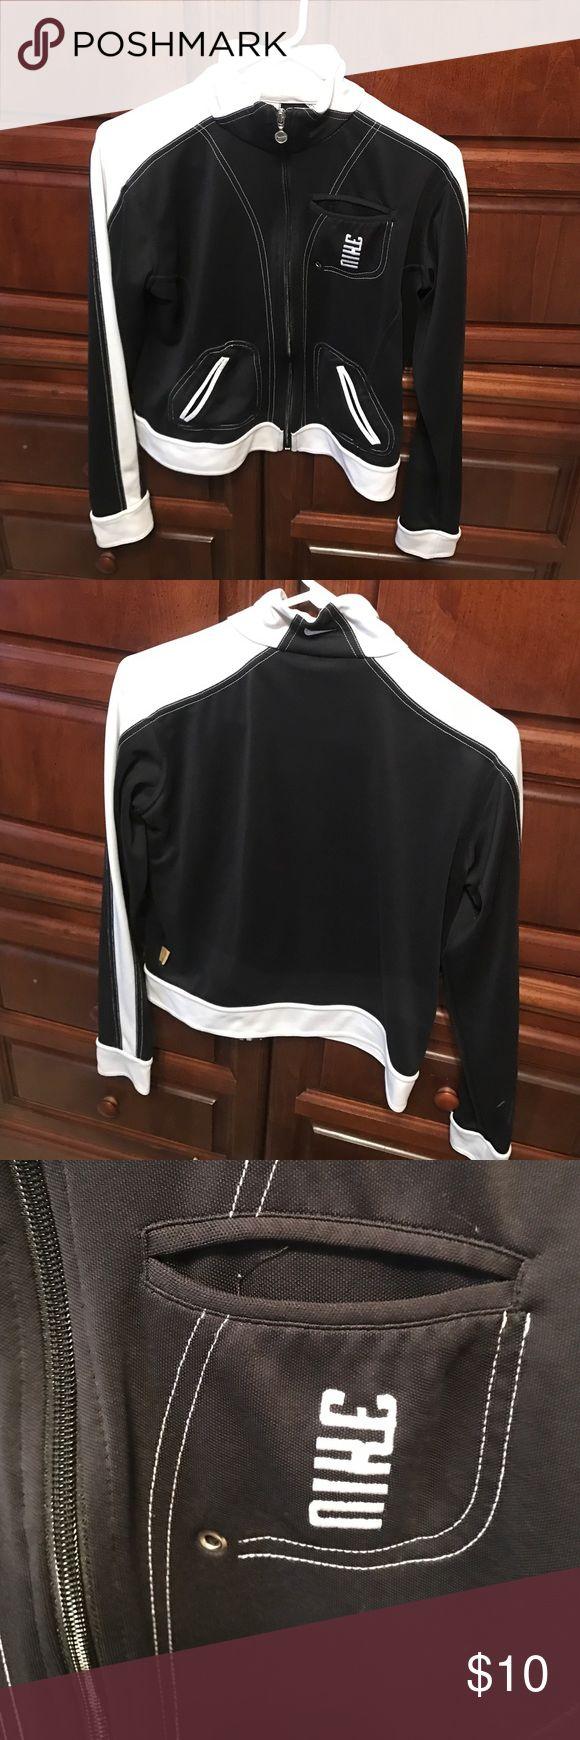 Nike jacket large Cute black and white with pockets Nike Jackets & Coats